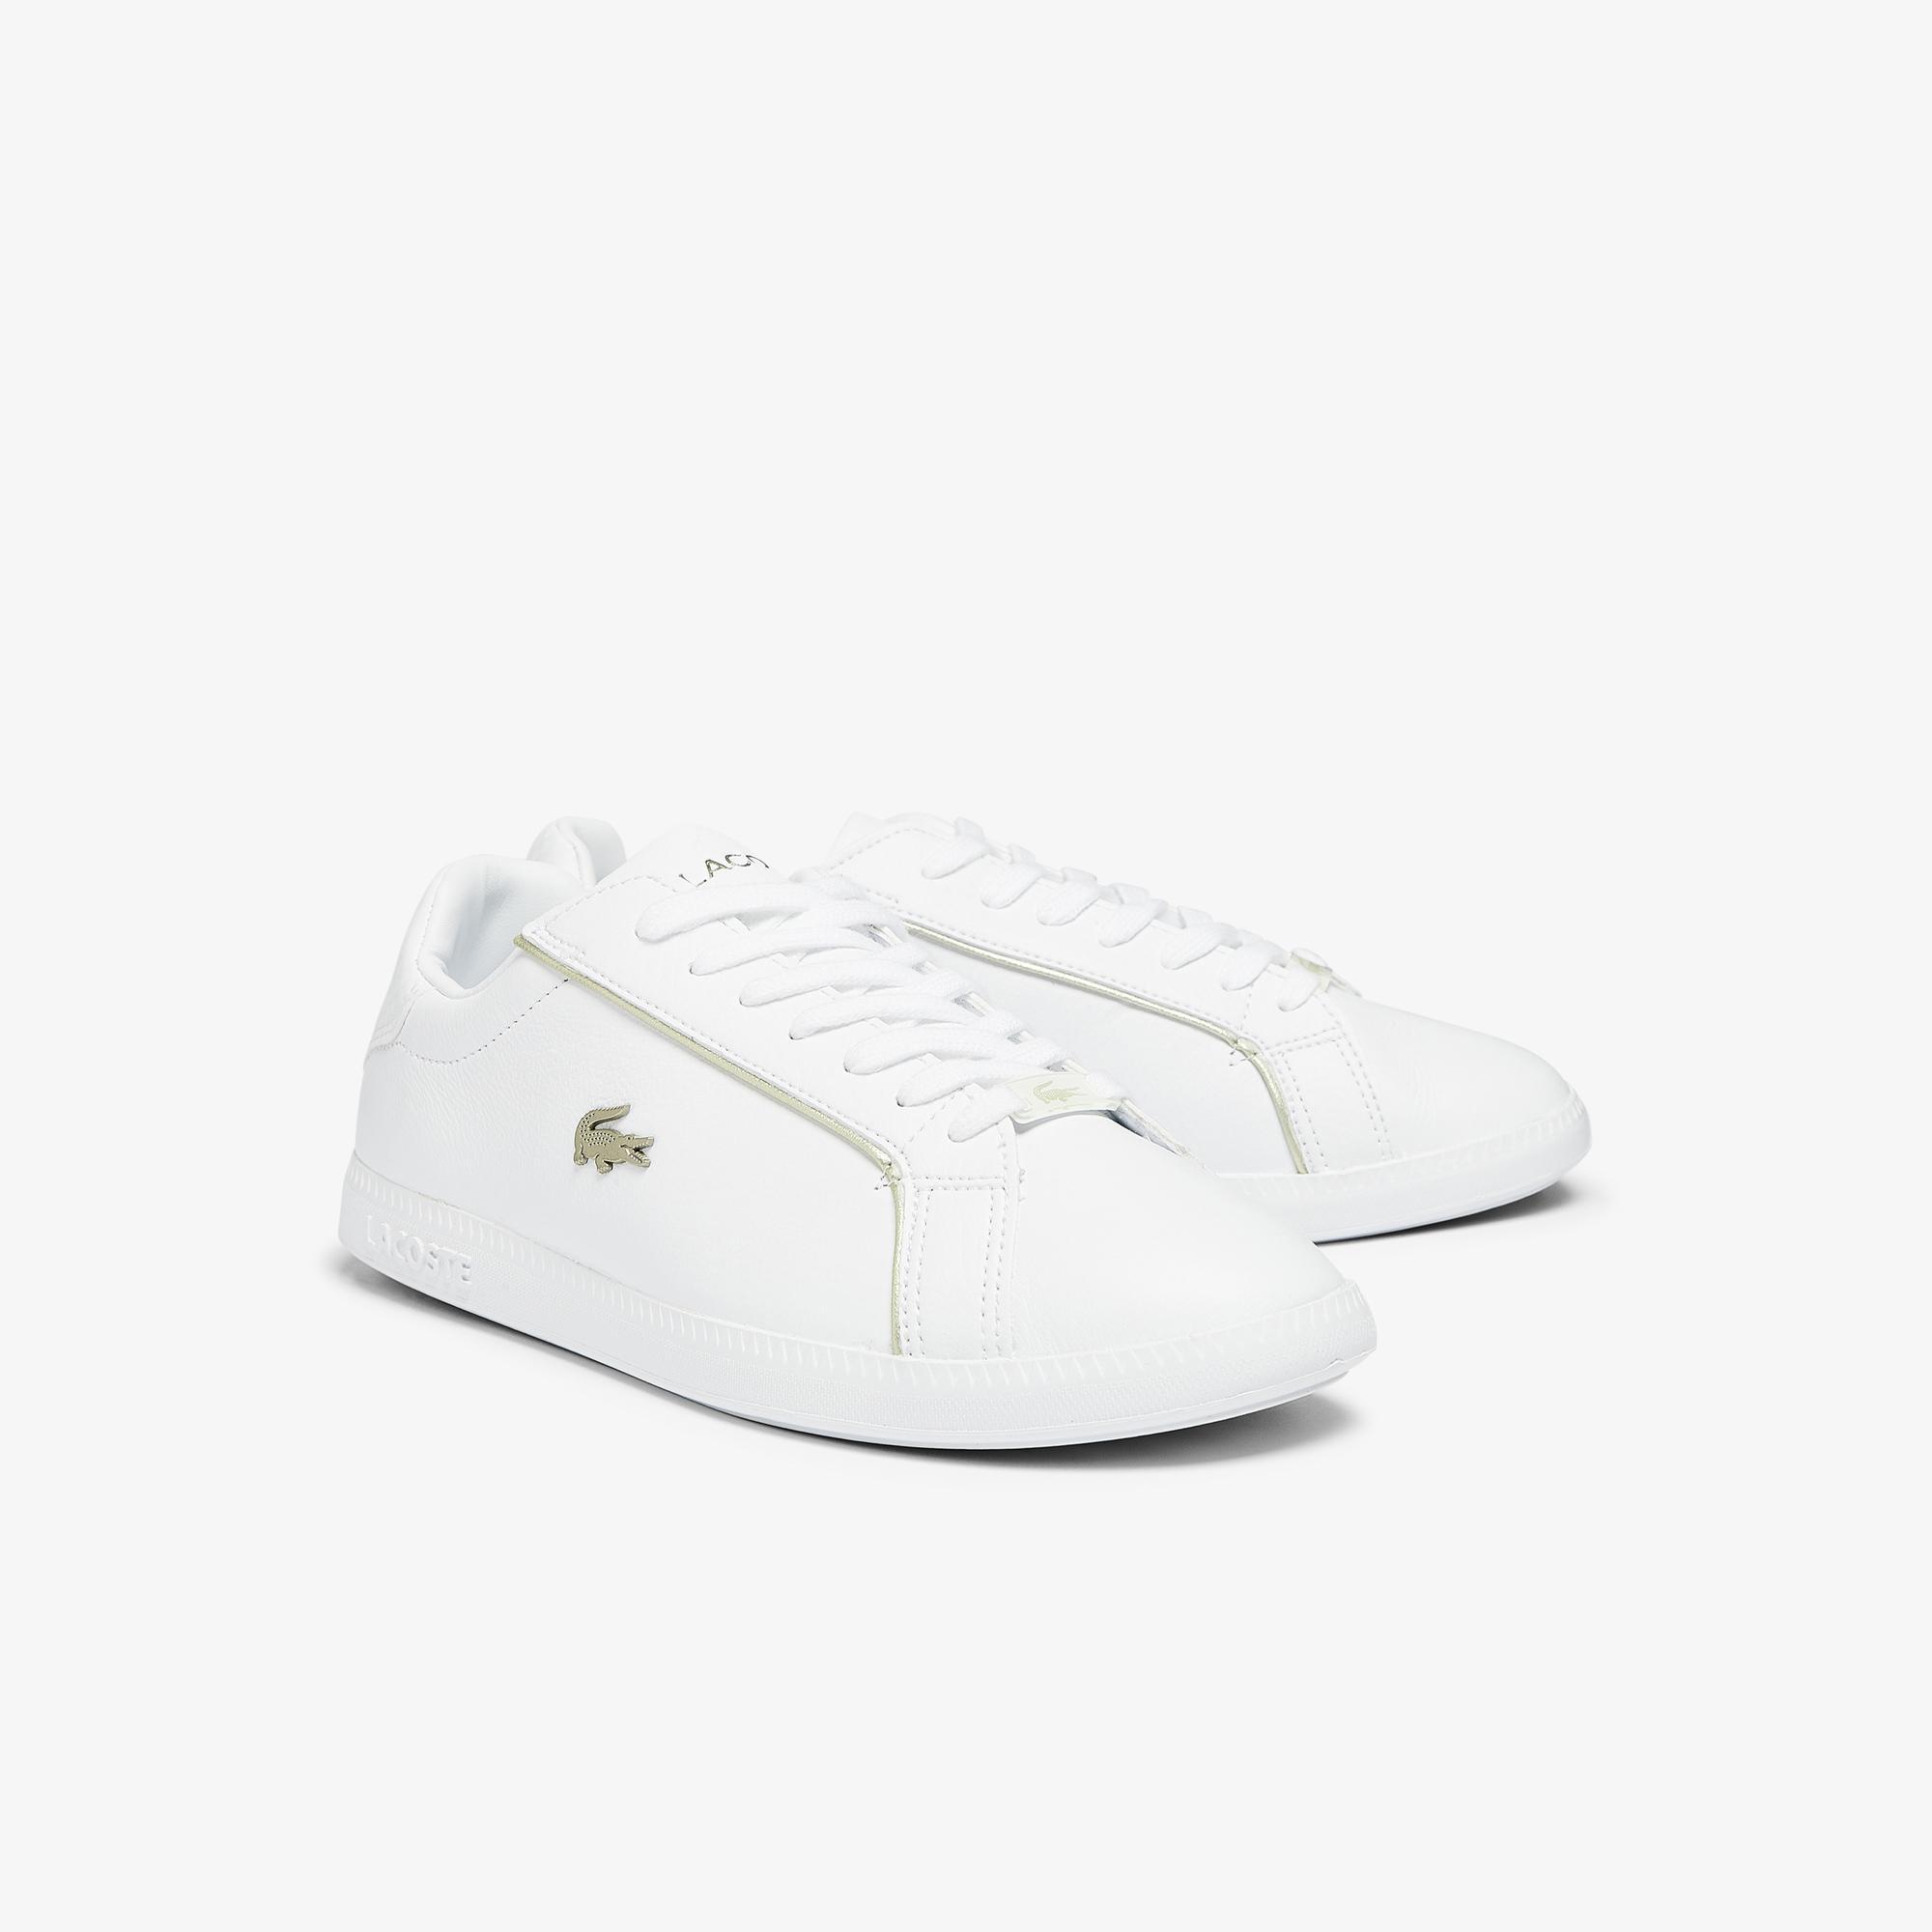 Lacoste Women's Graduate 0721 1 Sfa Shoes